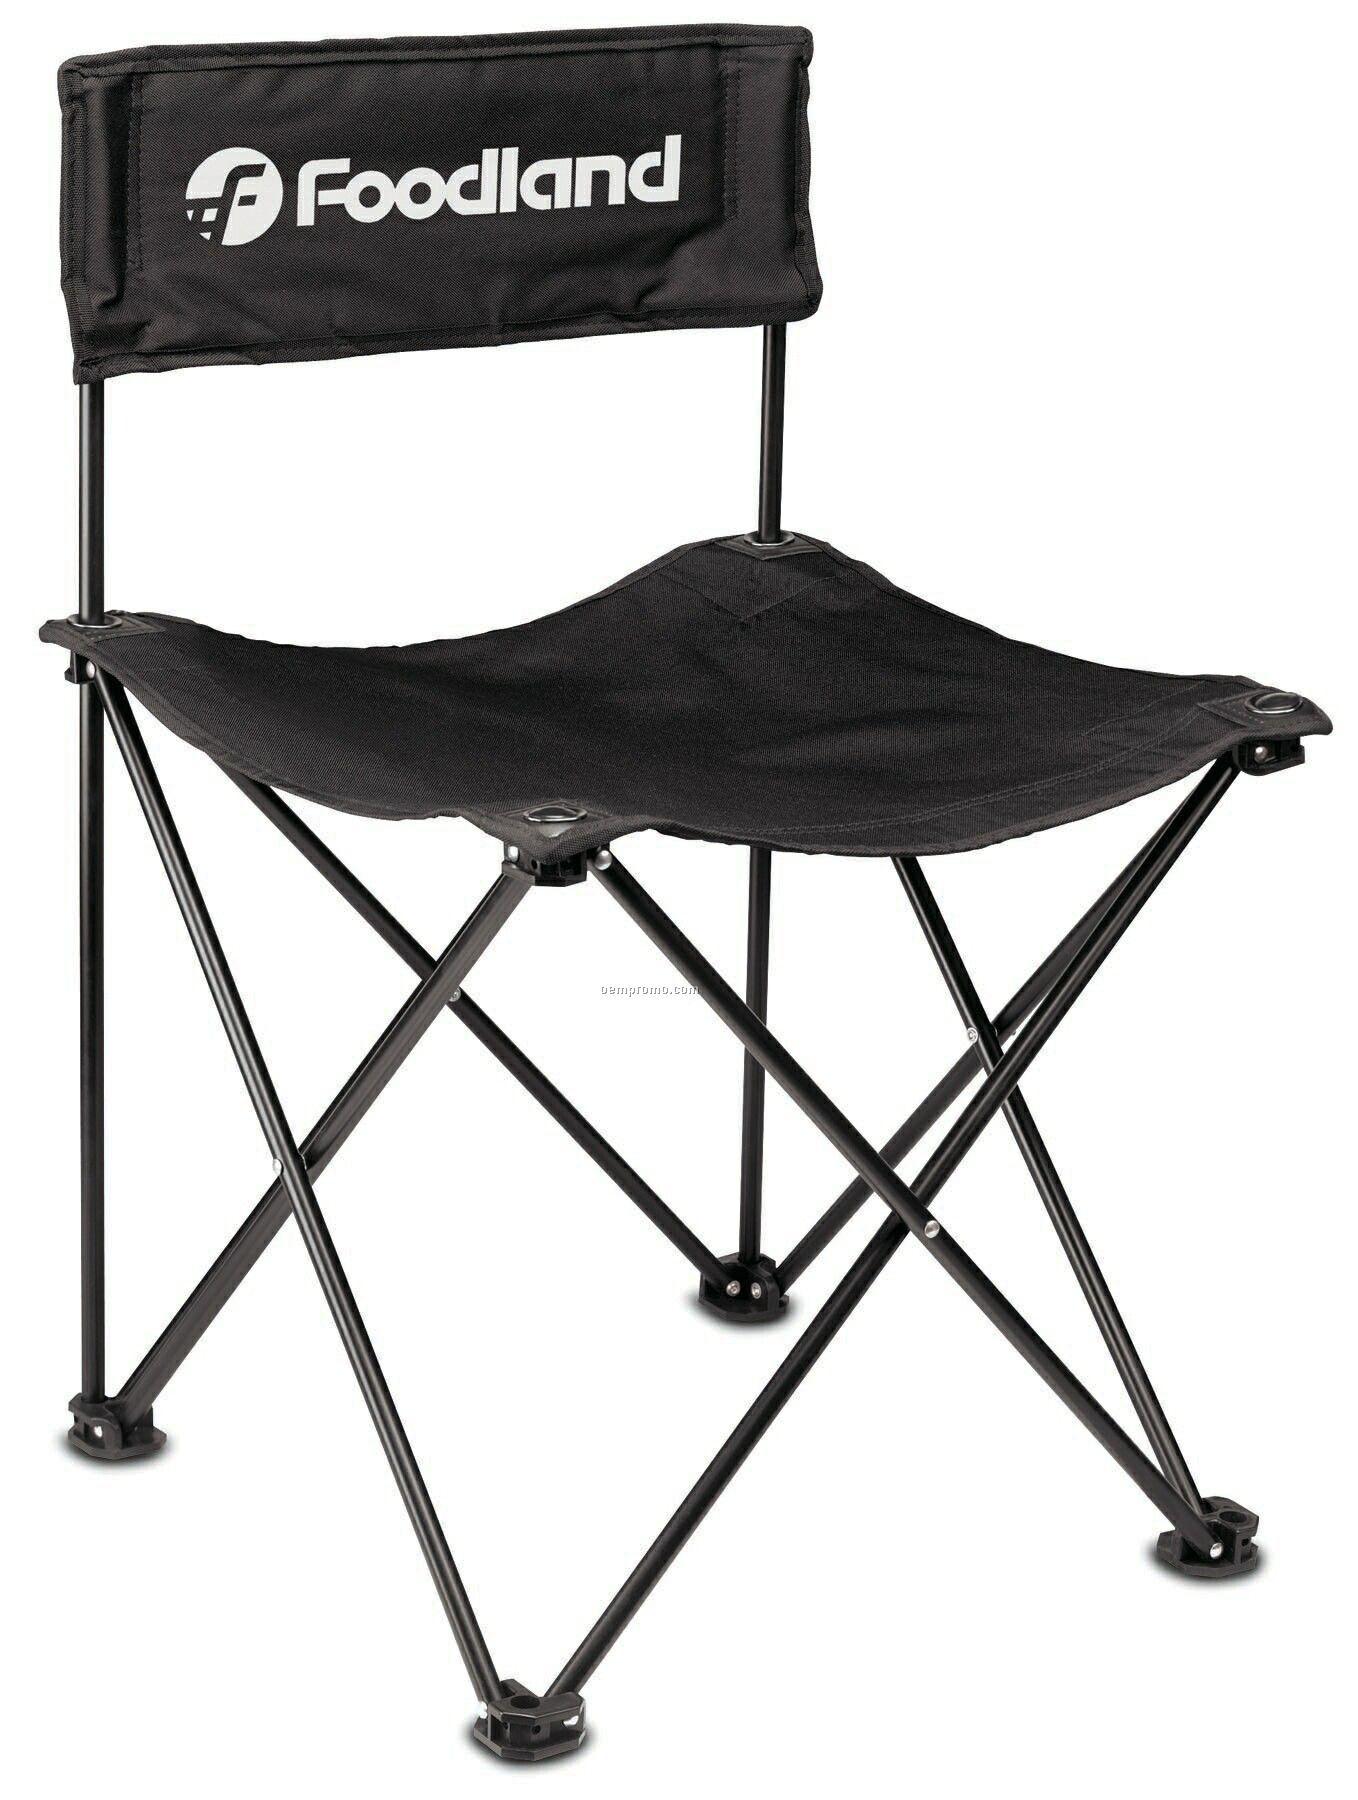 Rcc Koozie Quad Chair W/ Carry Bag